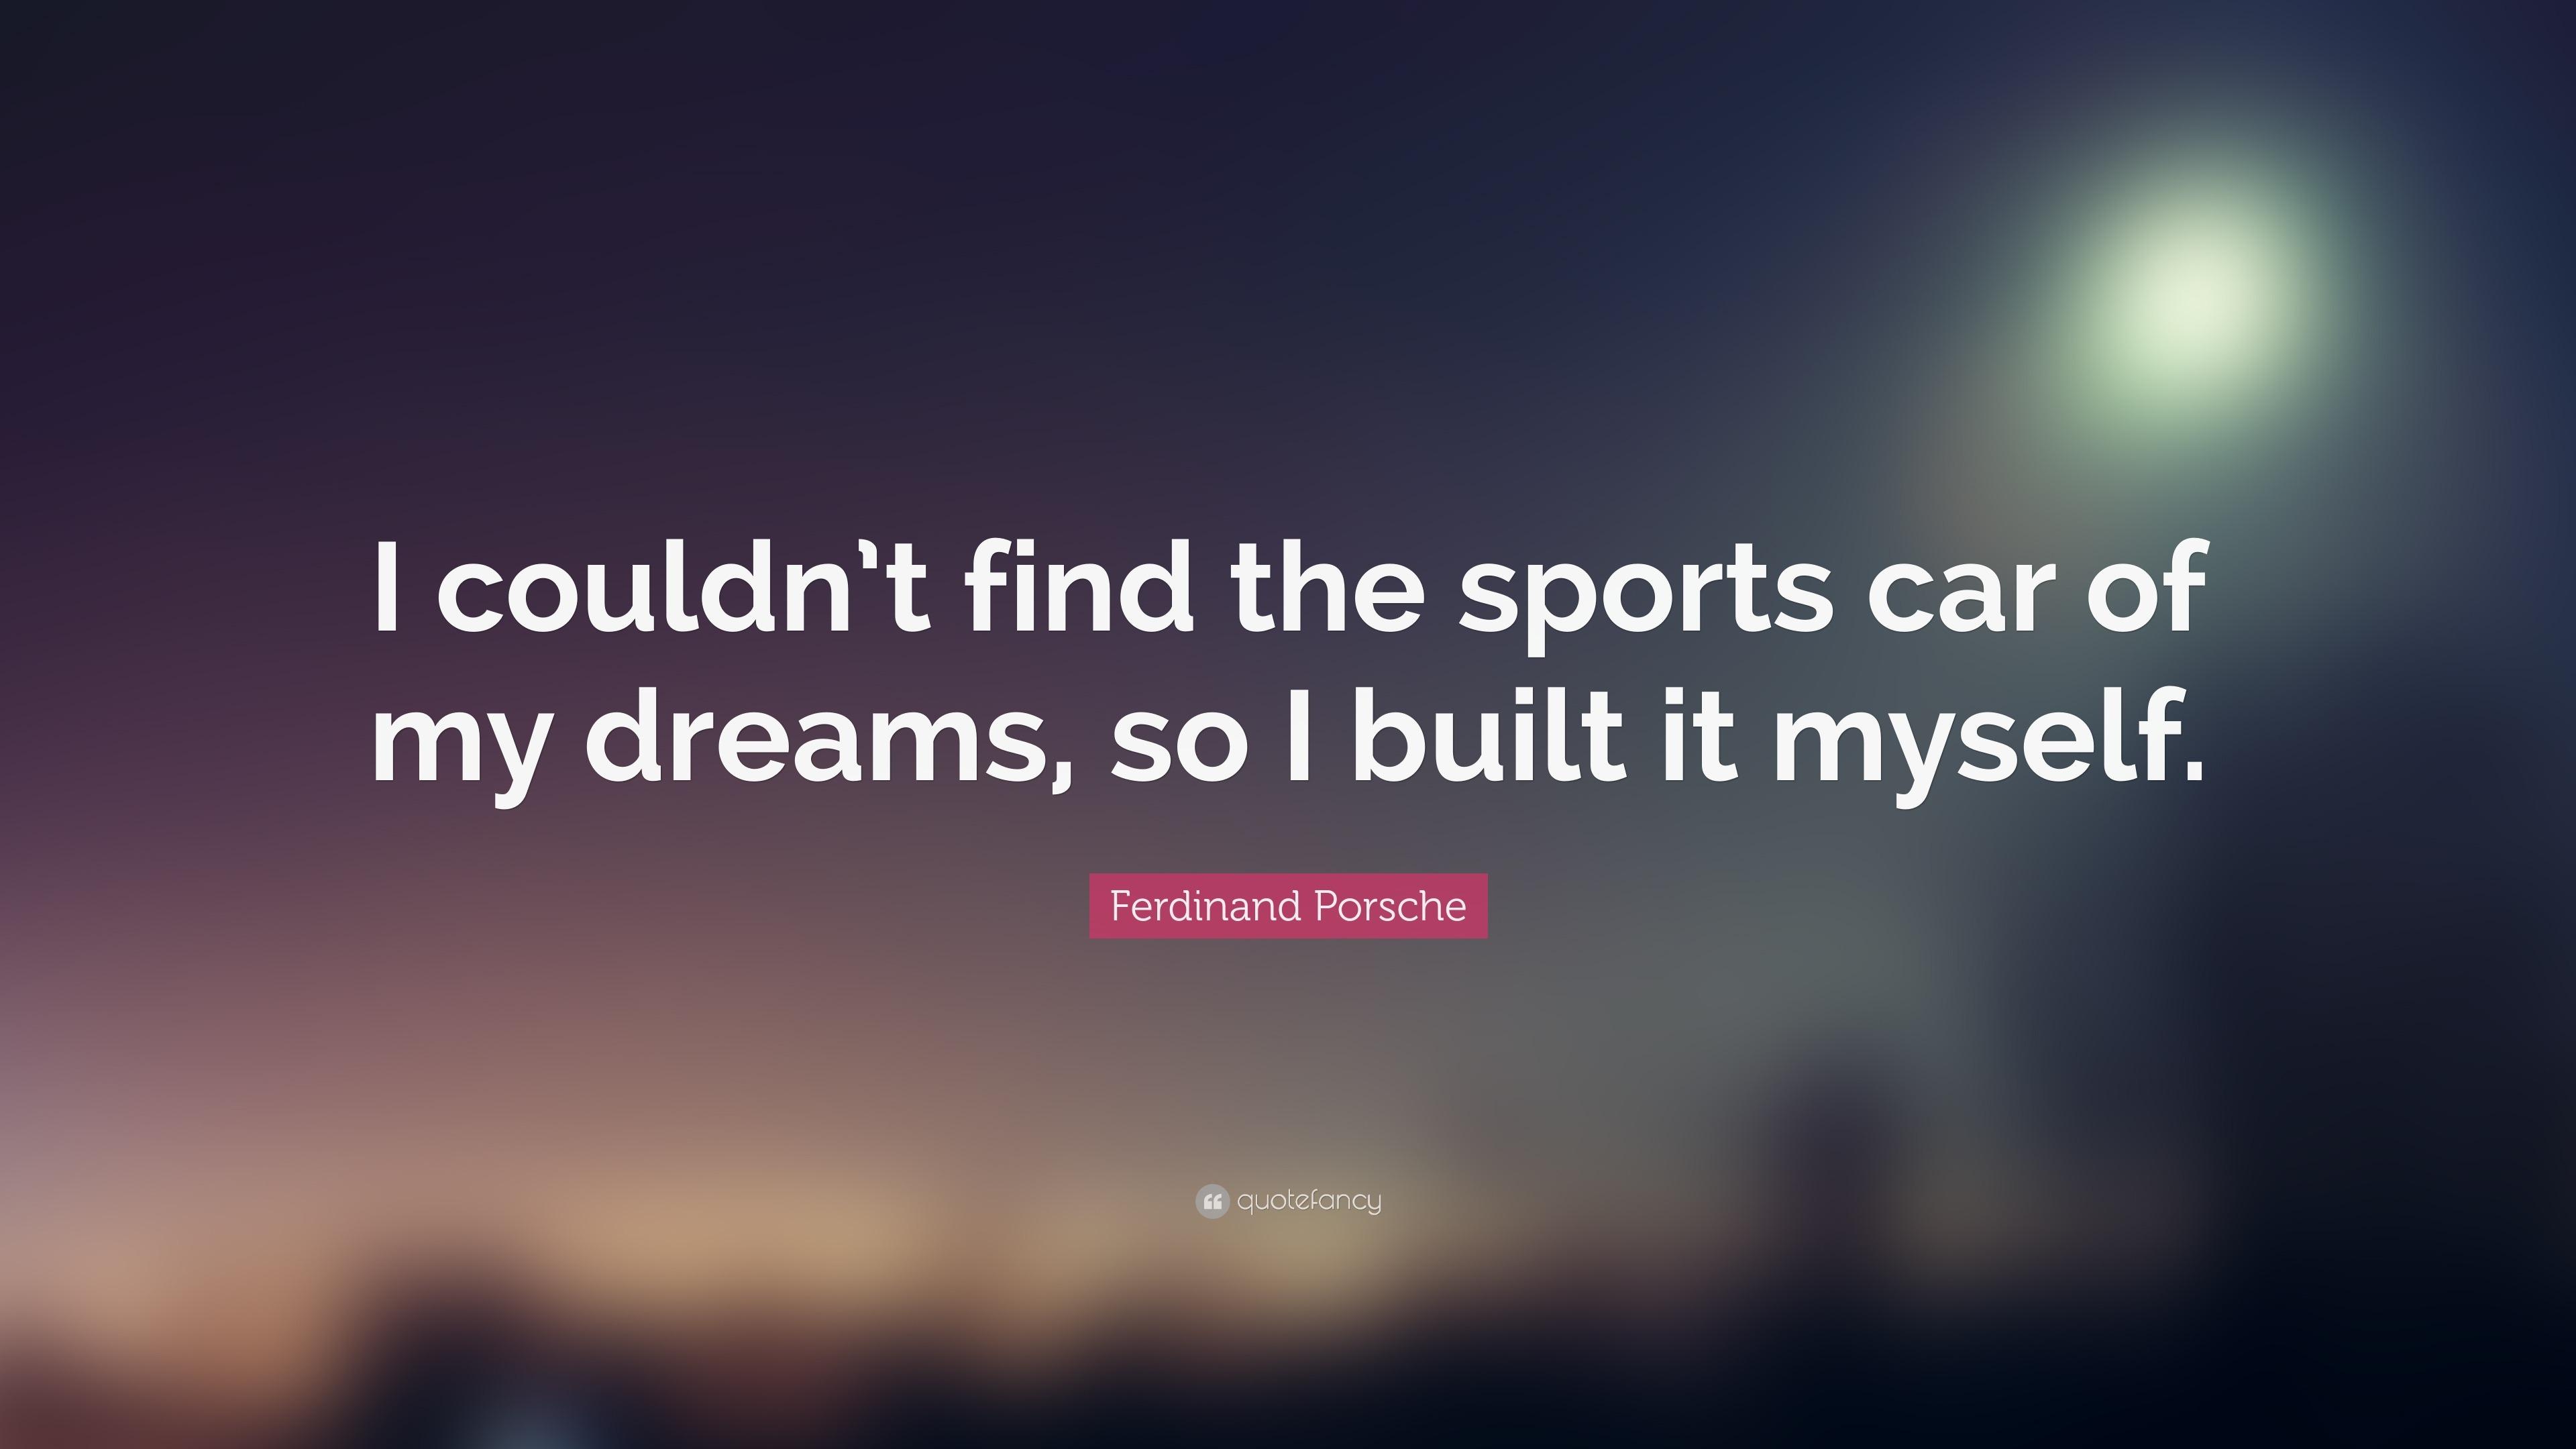 Ferdinand Porsche Quote \u201cI couldn\u0027t find the sports car of